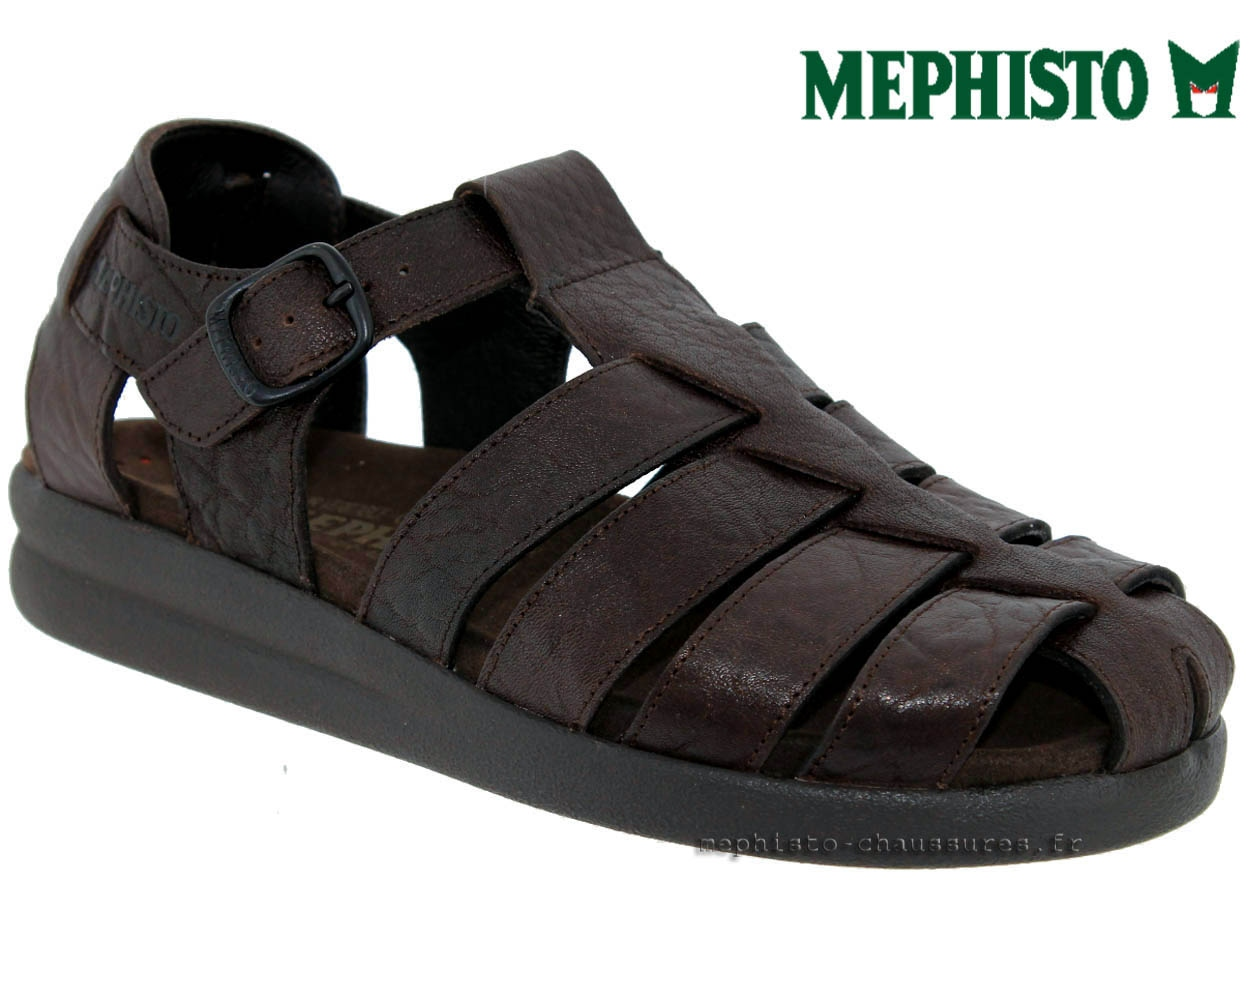 Mephisto Sandale Cuir Marron Sam Grain W4nnq7vz0